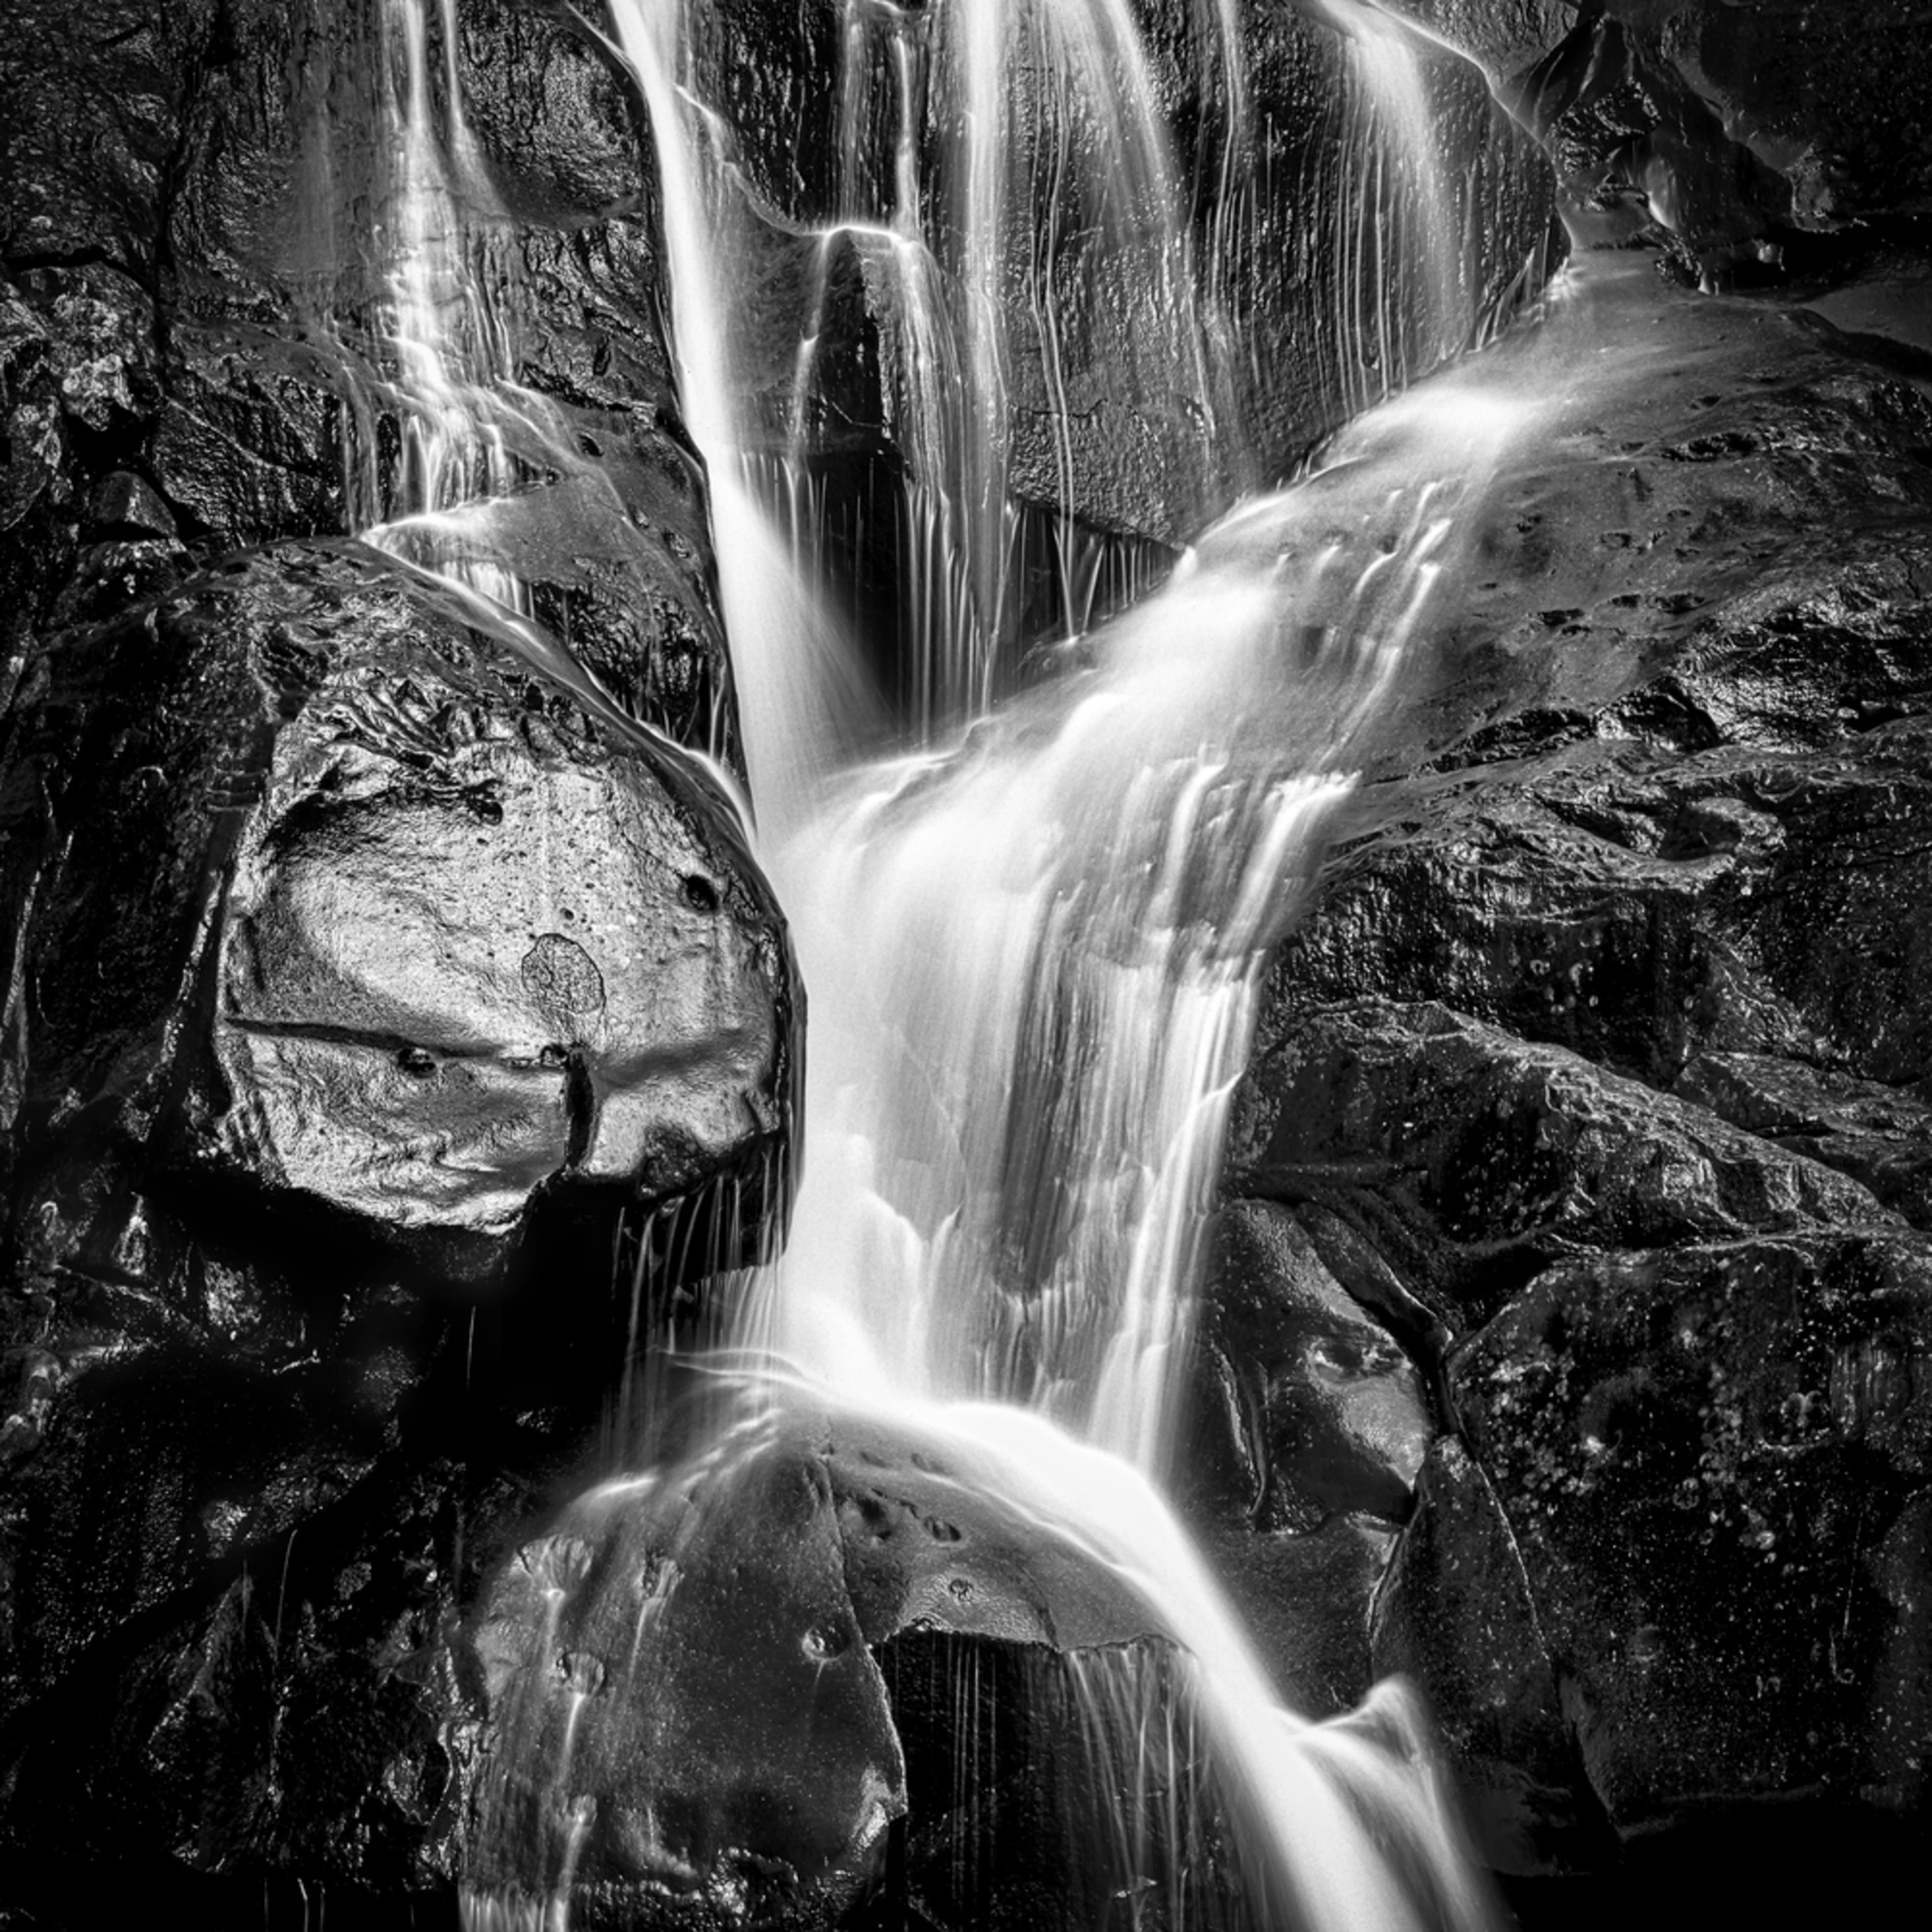 Waterfall 23 ussshx